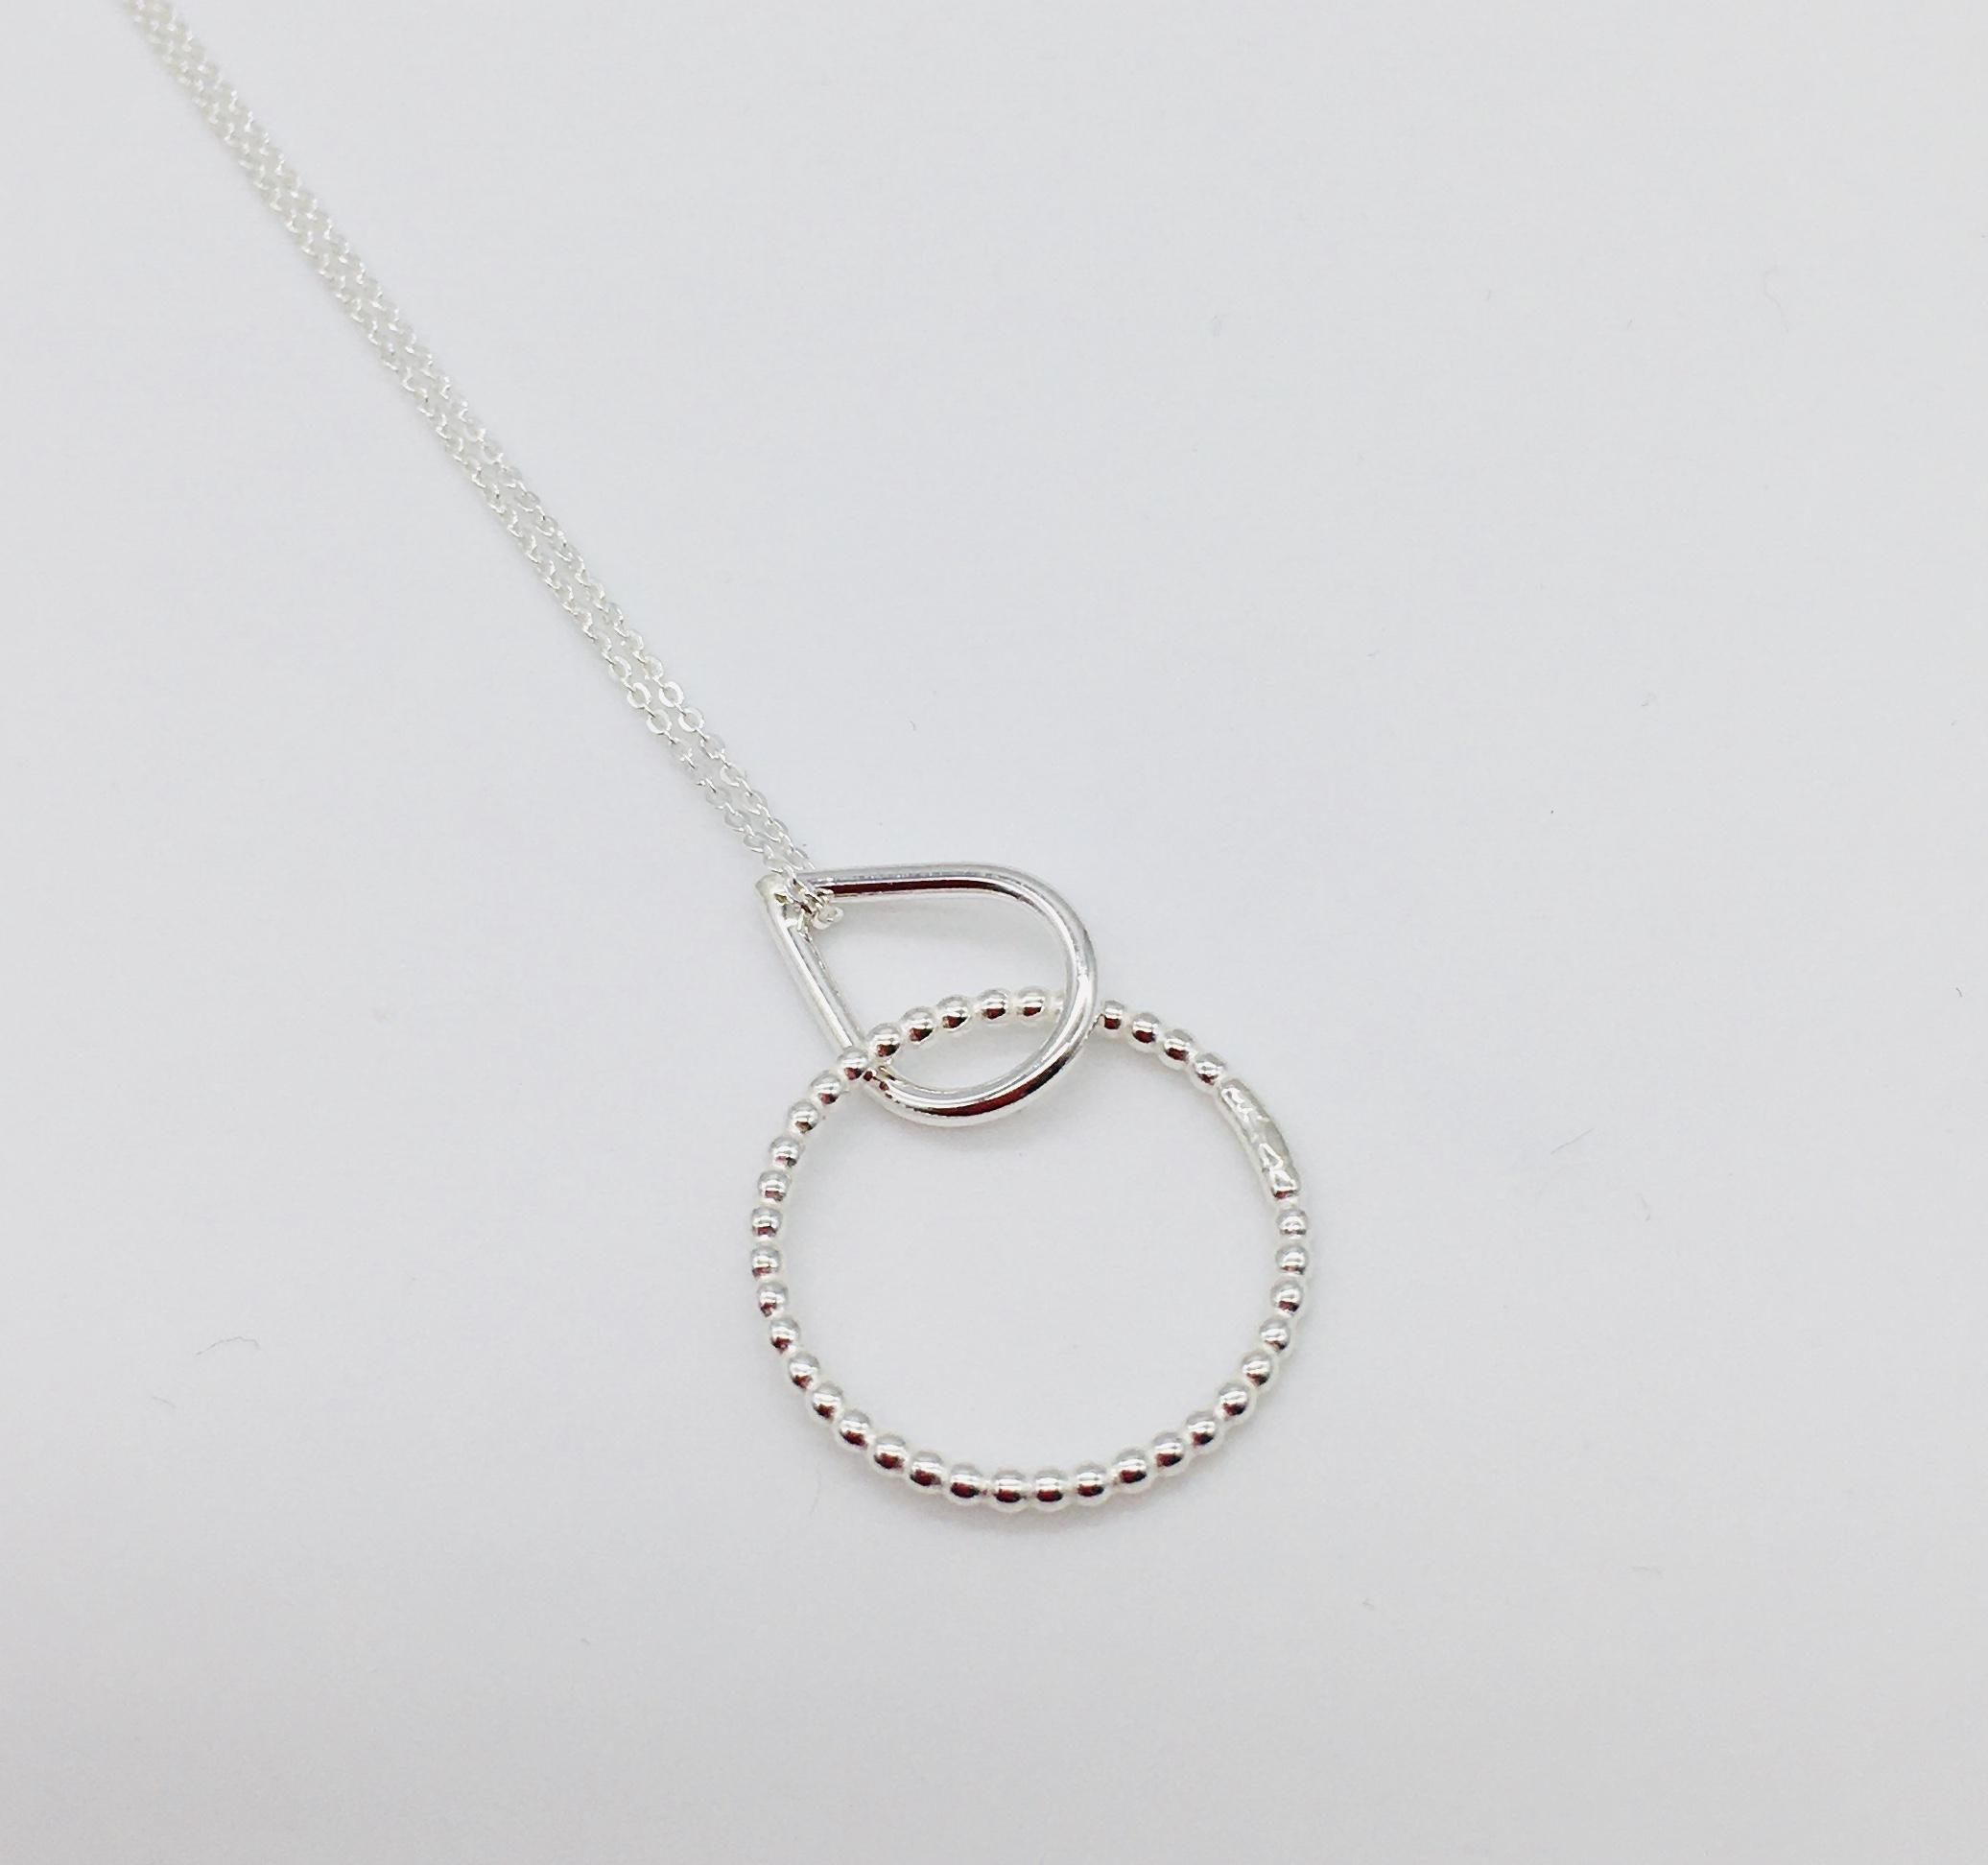 Teardrop/dotty circle pendant in silver, handmade in Devon by silversmith Claire Lowe